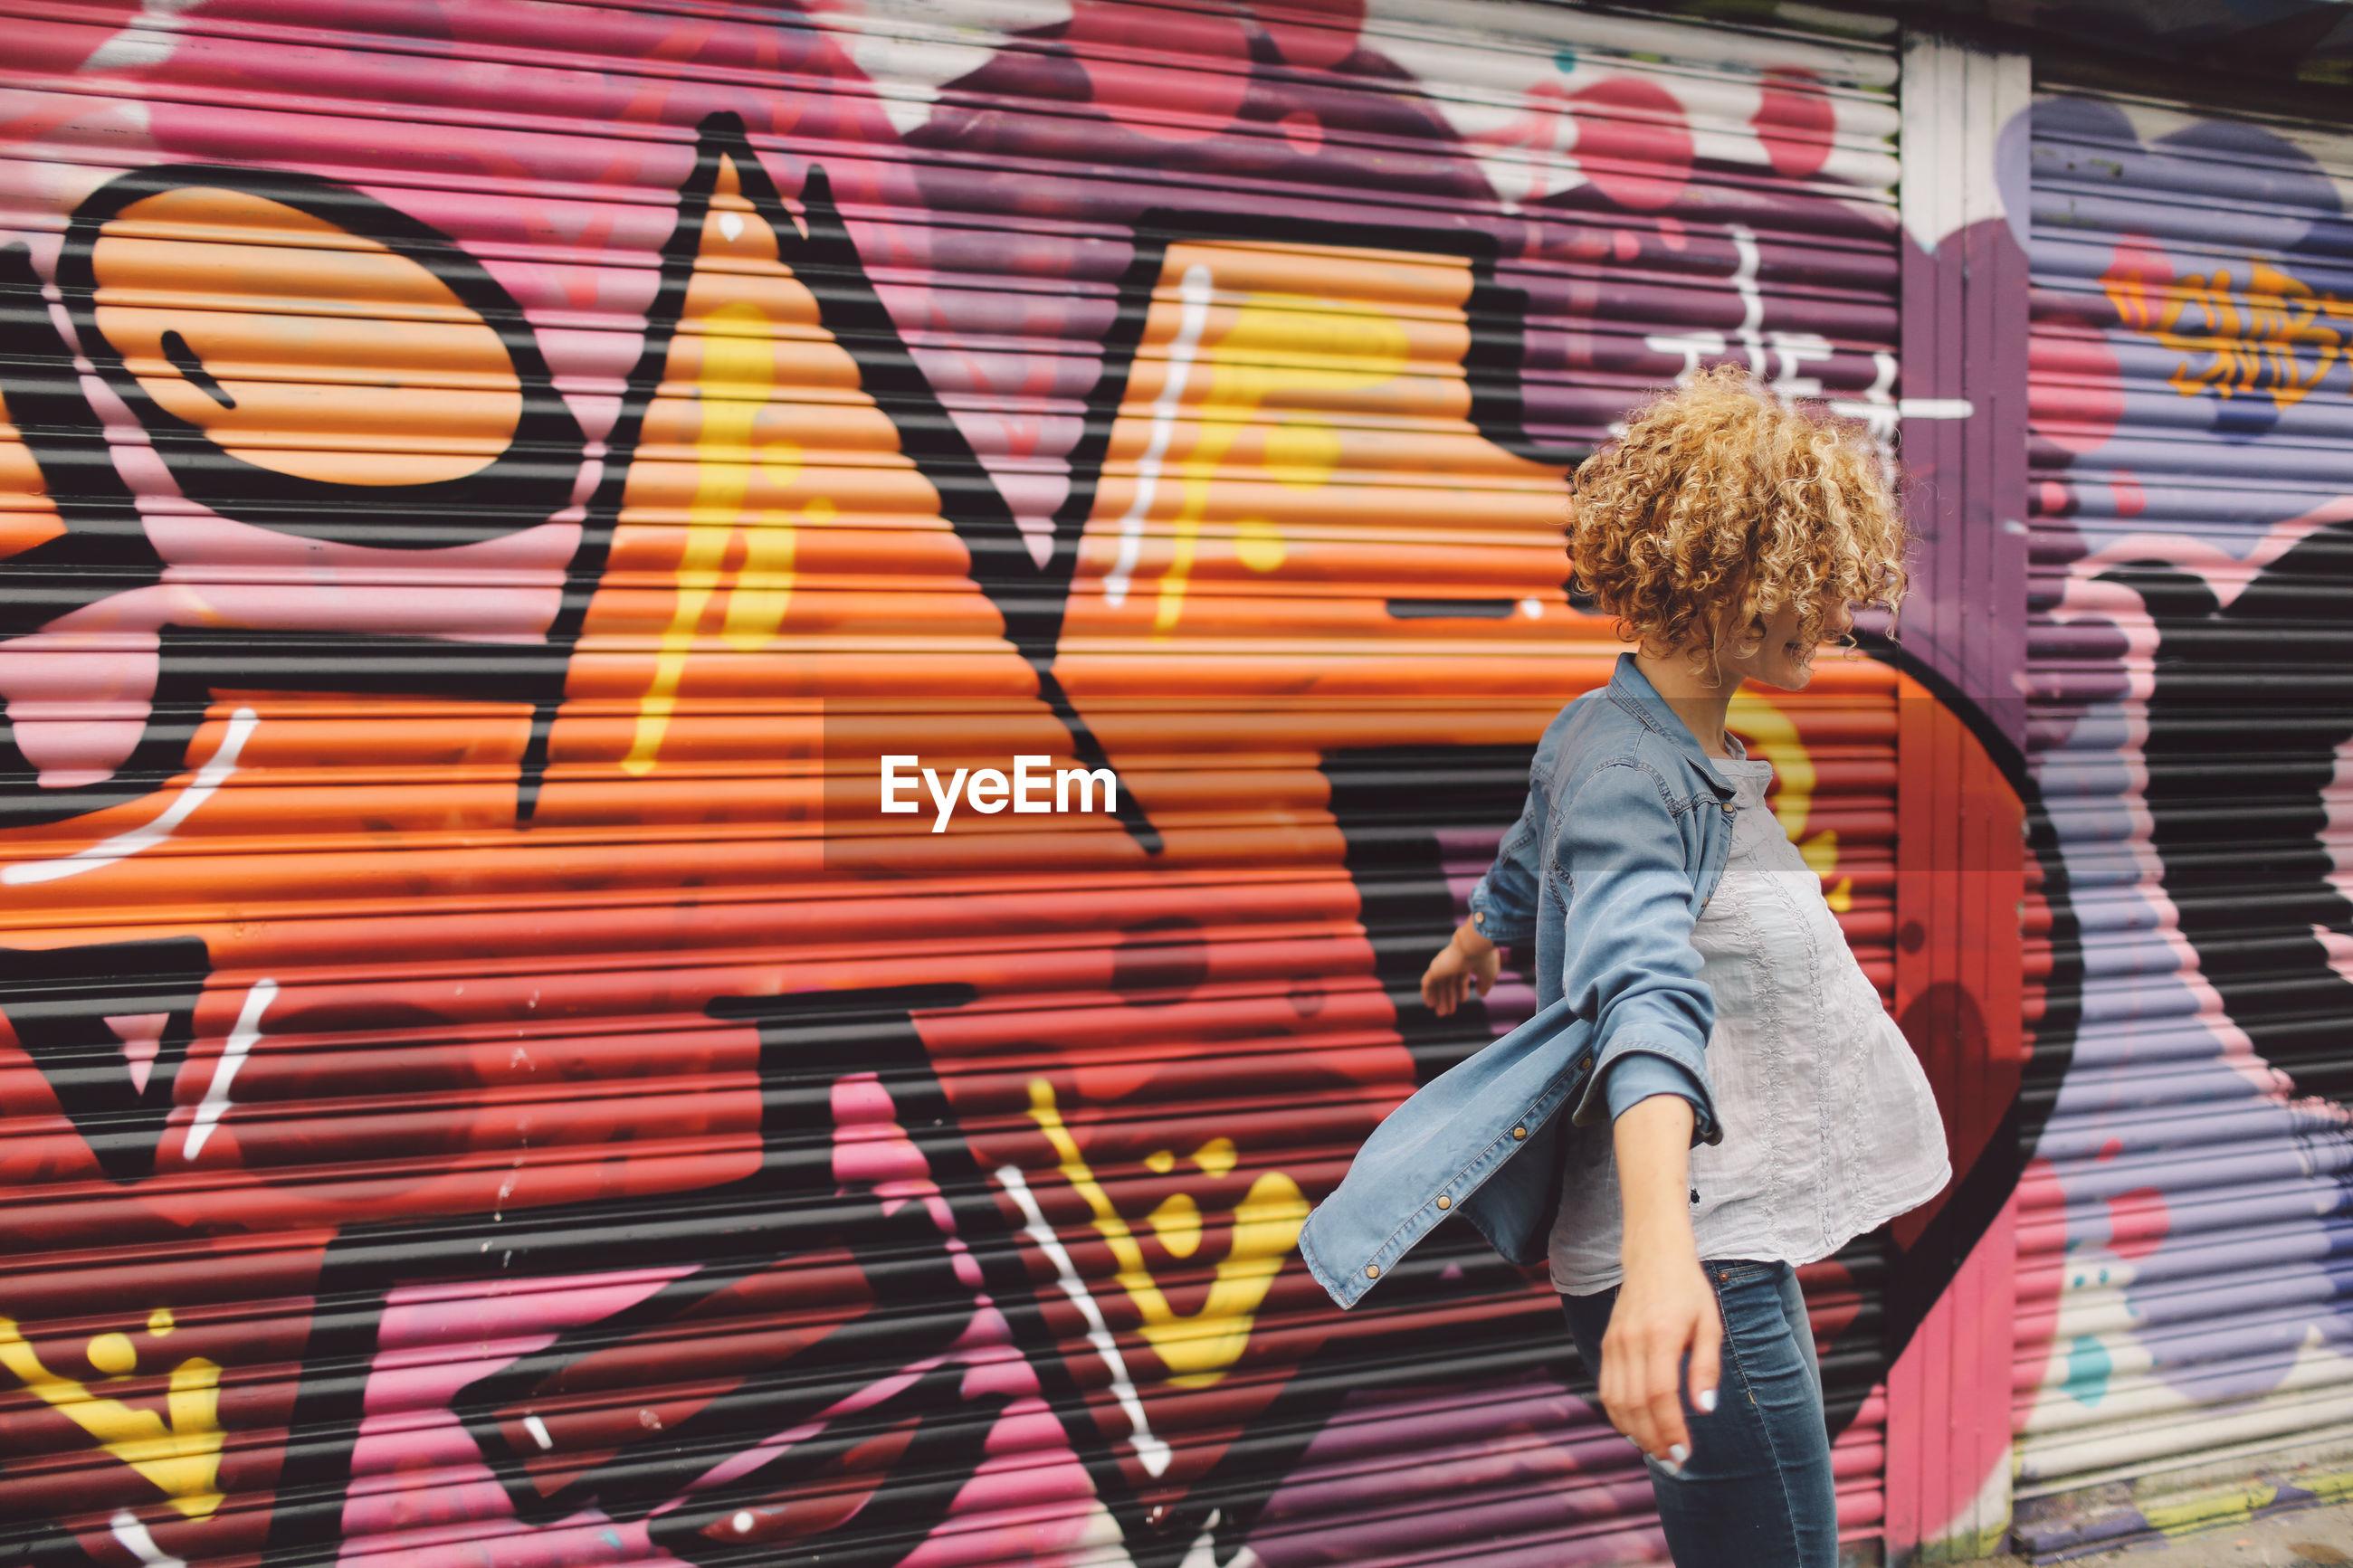 Young woman dancing against graffiti shutter